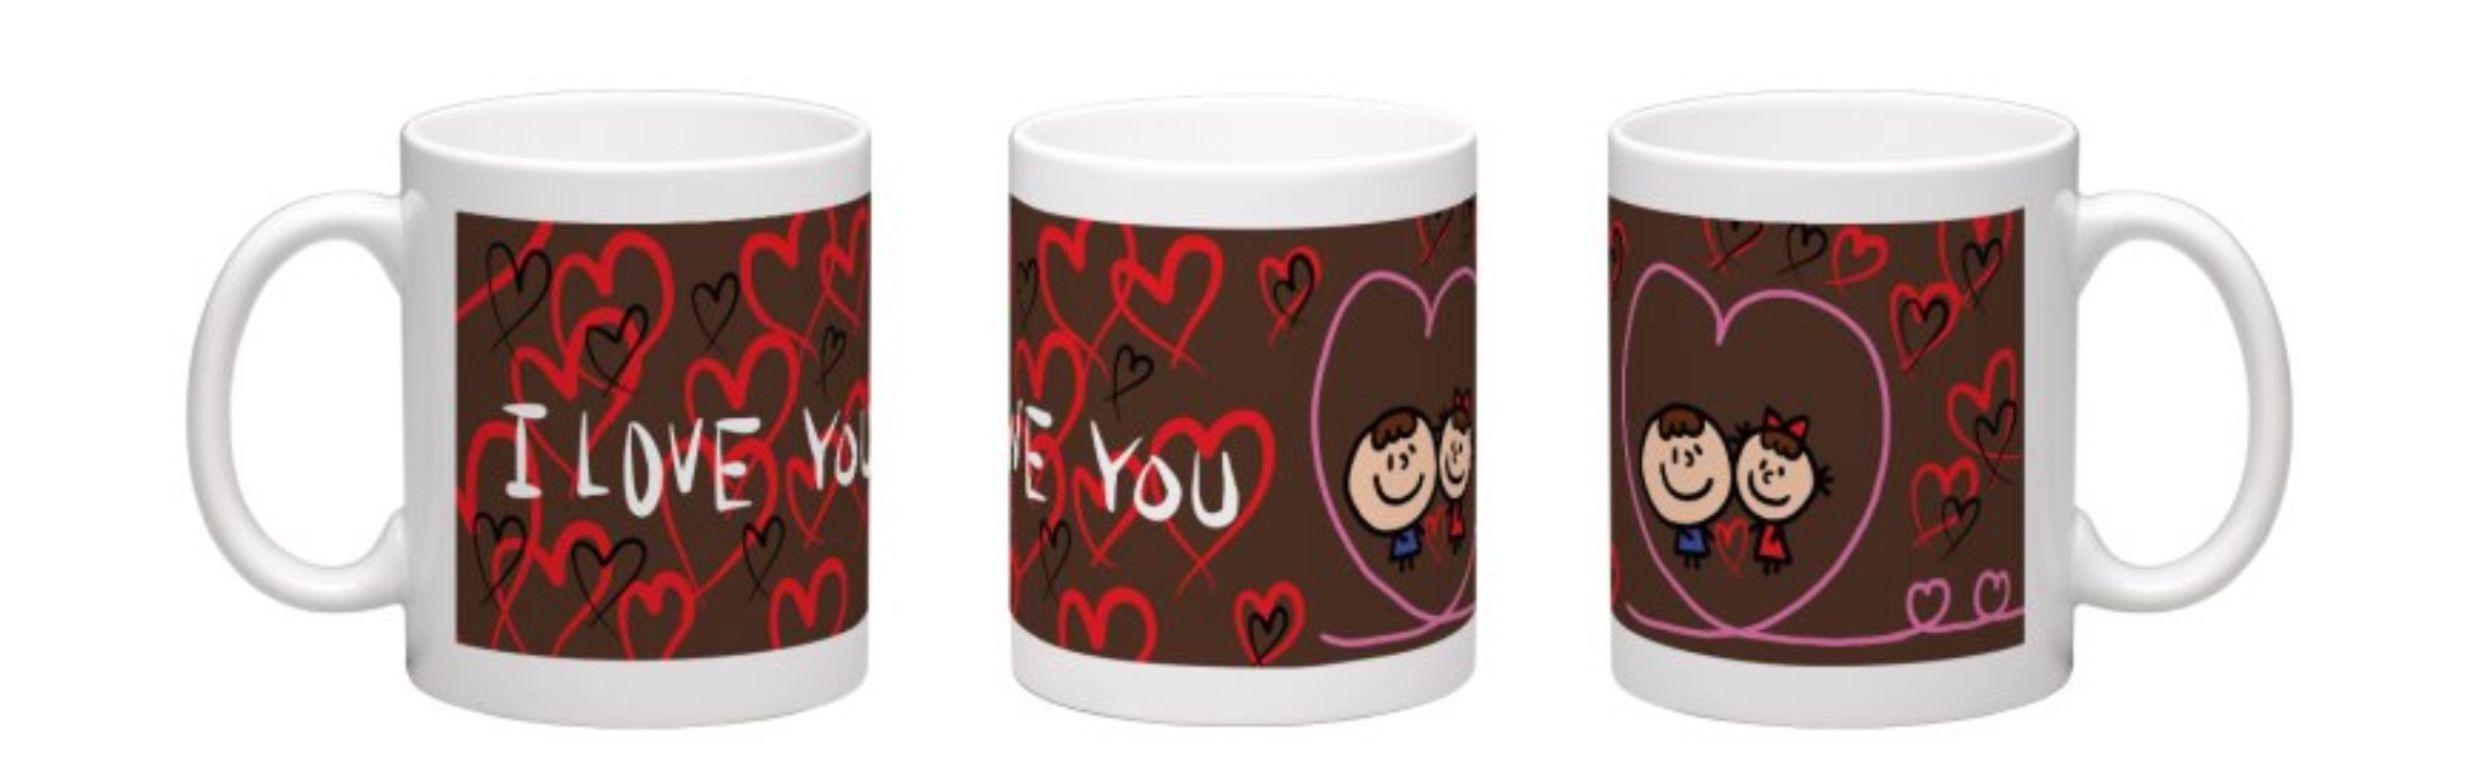 【I love you】マグカップ